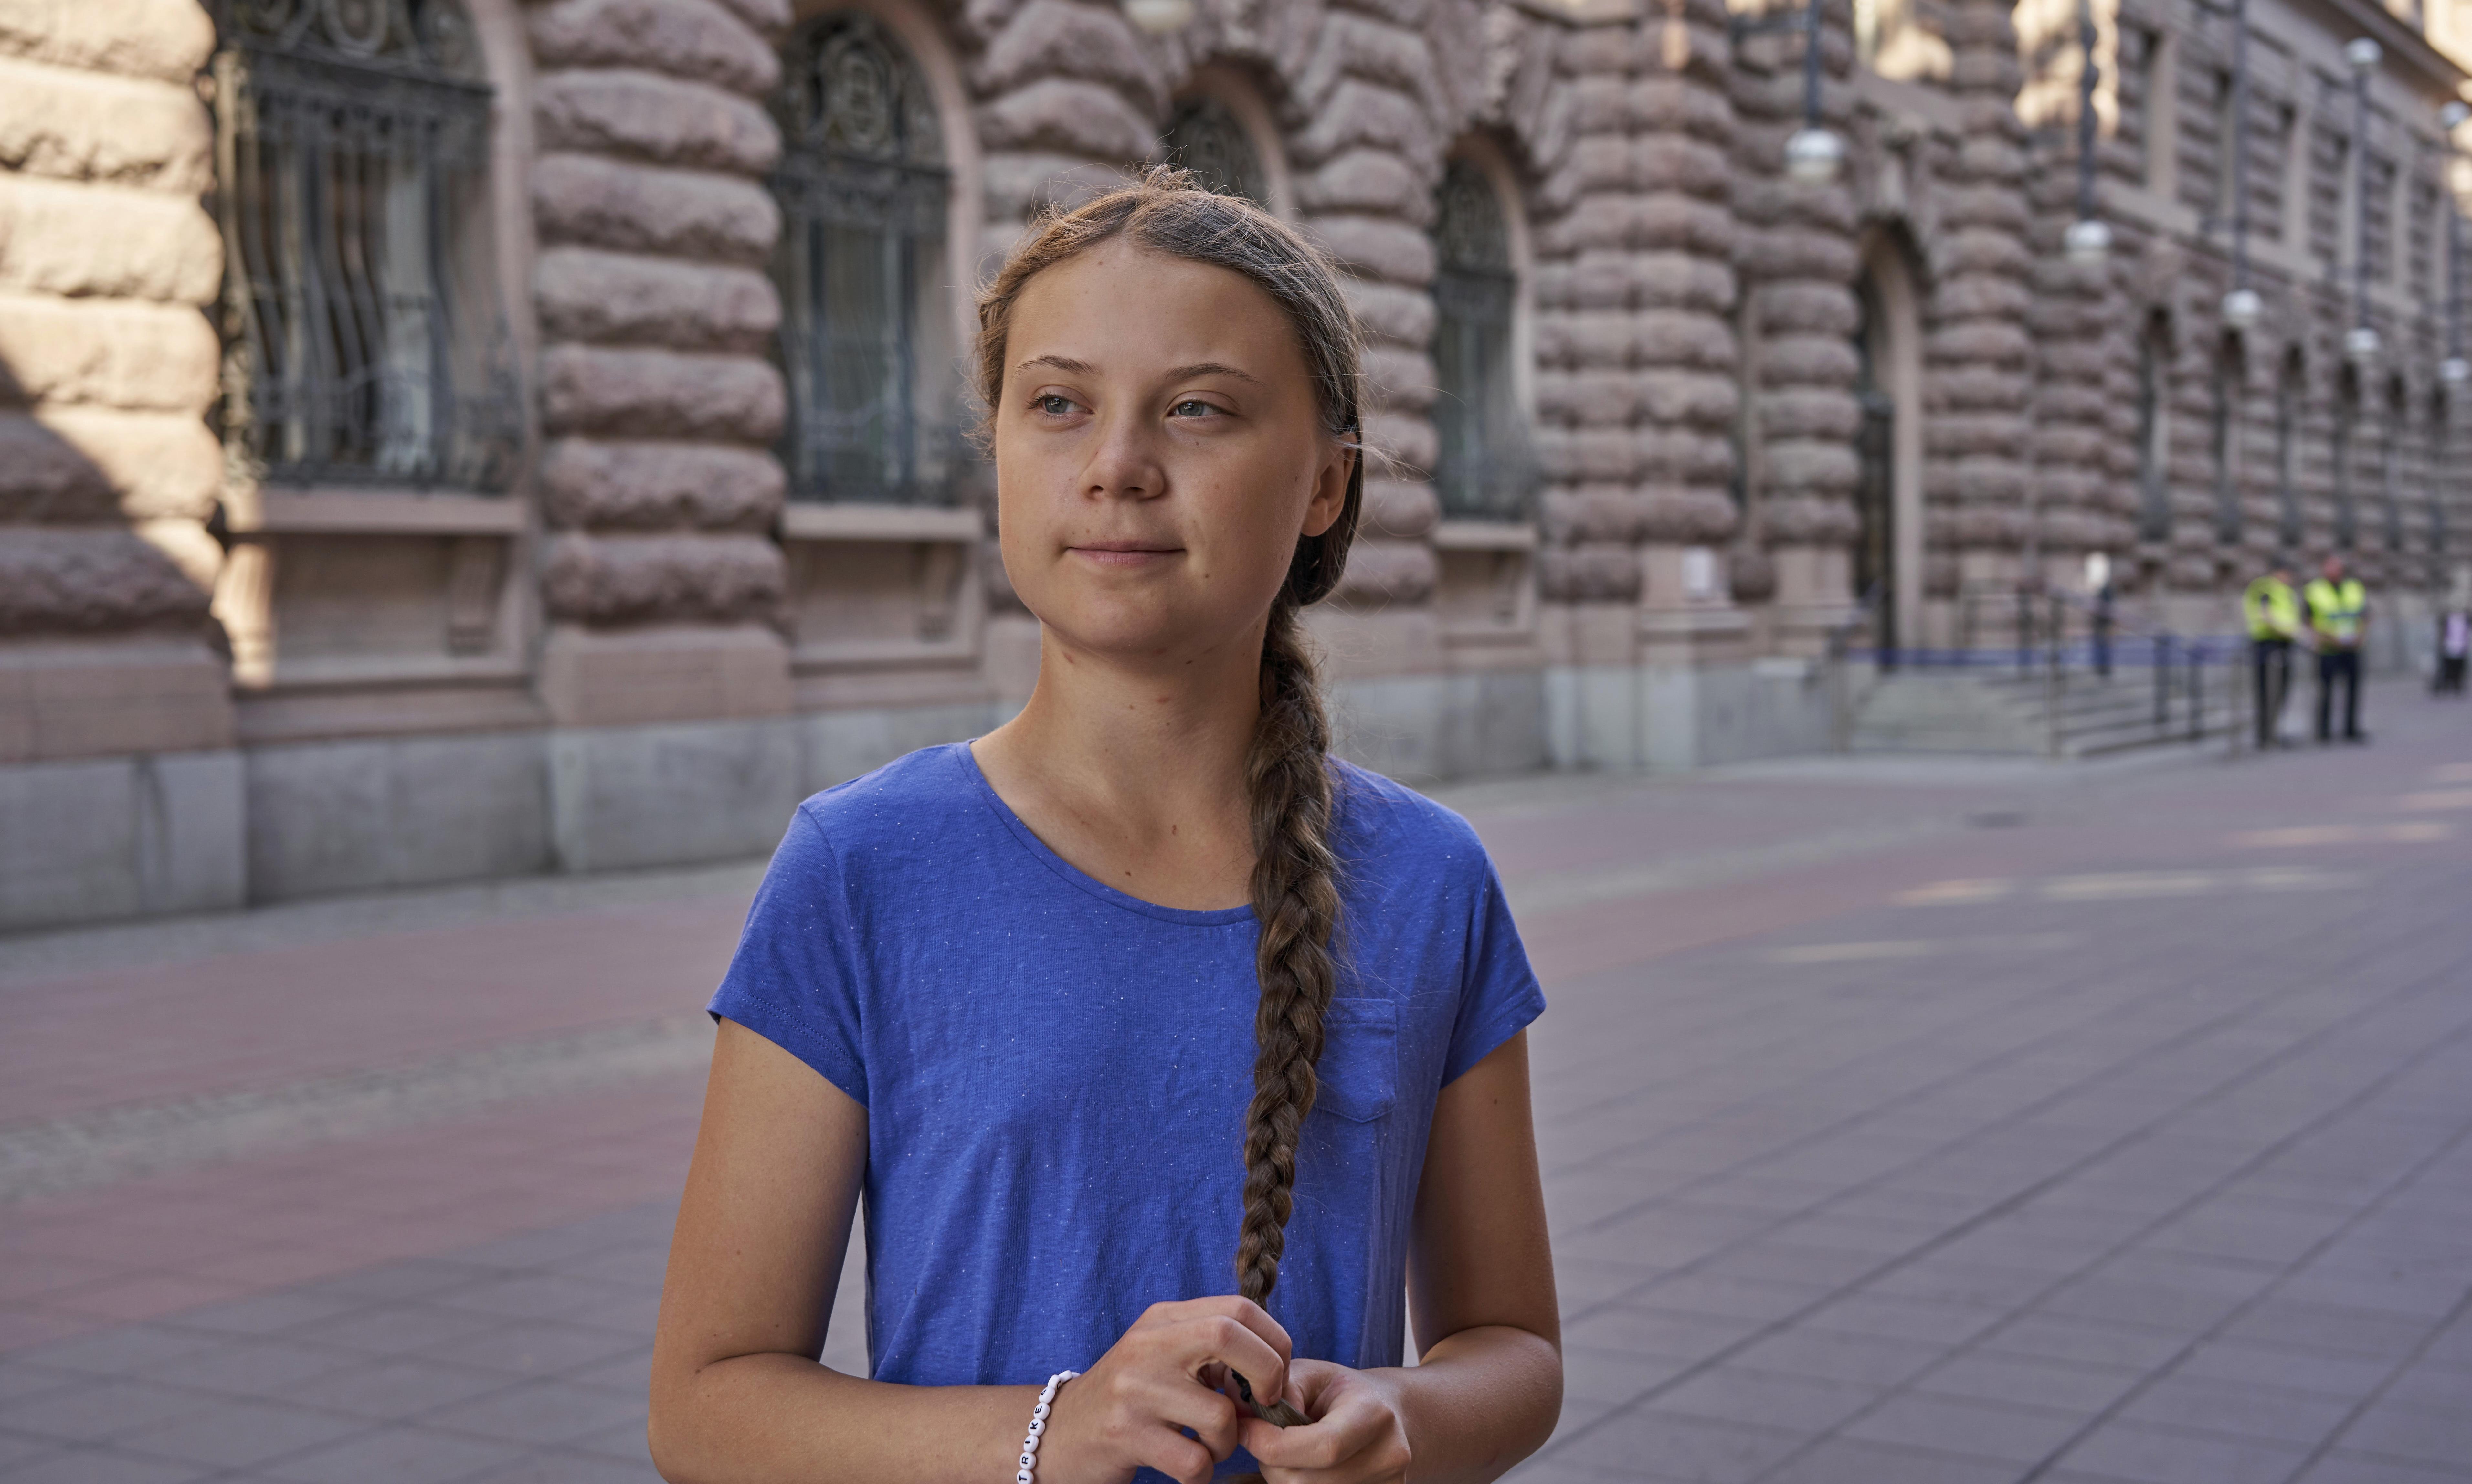 Morning mail: Greta Thunberg hits back at Bolt, Christensen's reef trip, Crosby tactics exposed